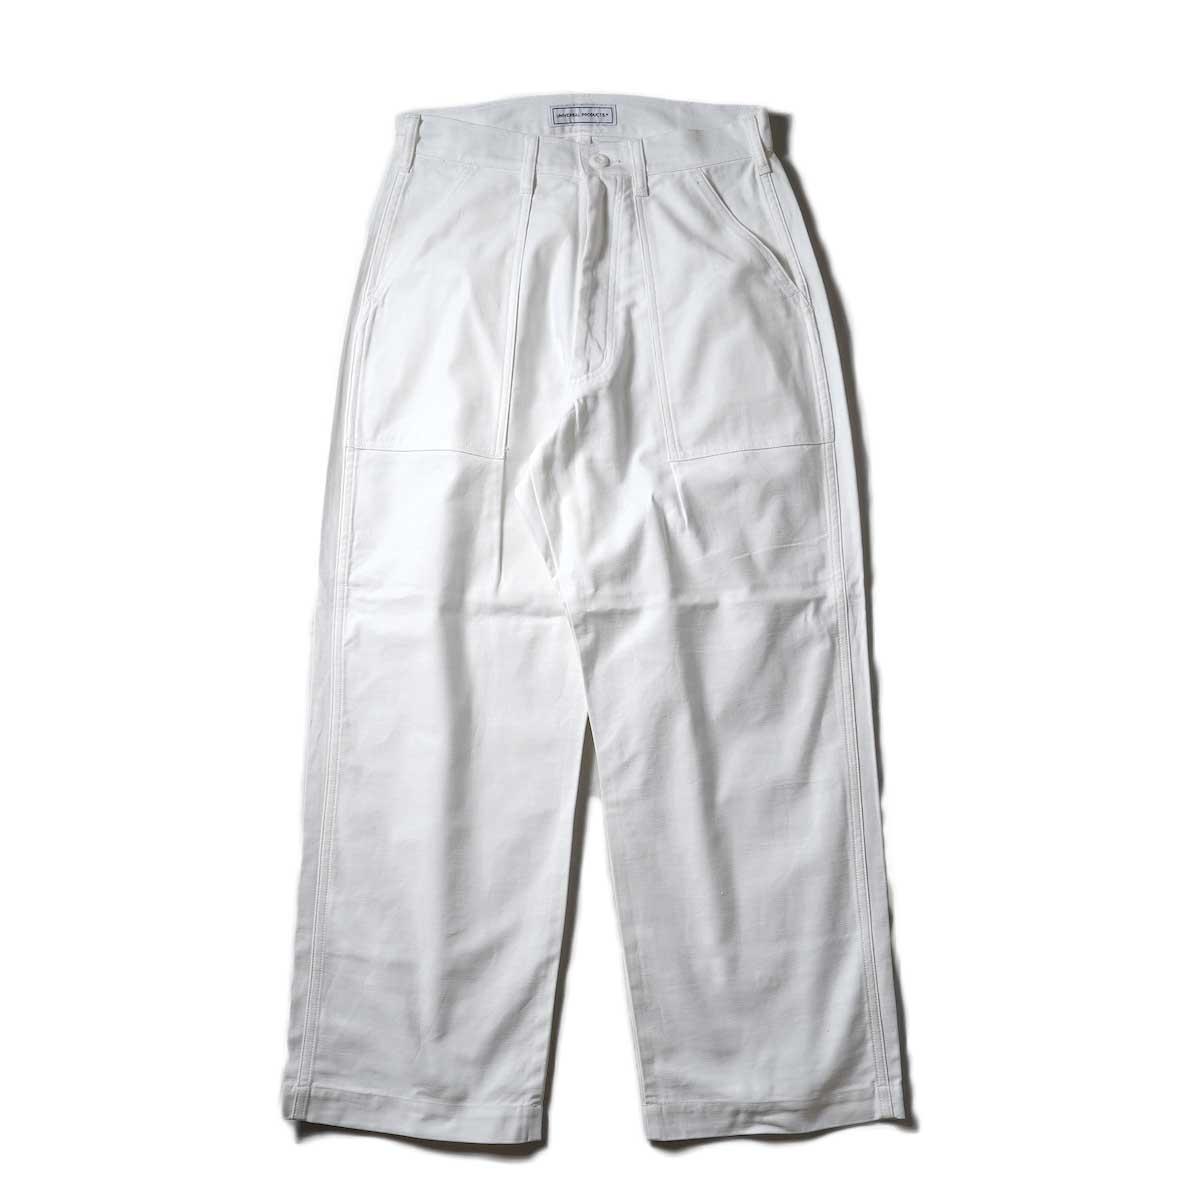 UNIVERSAL PRODUCTS / Gung Ho 1tuck Baker Pants (Ivory)